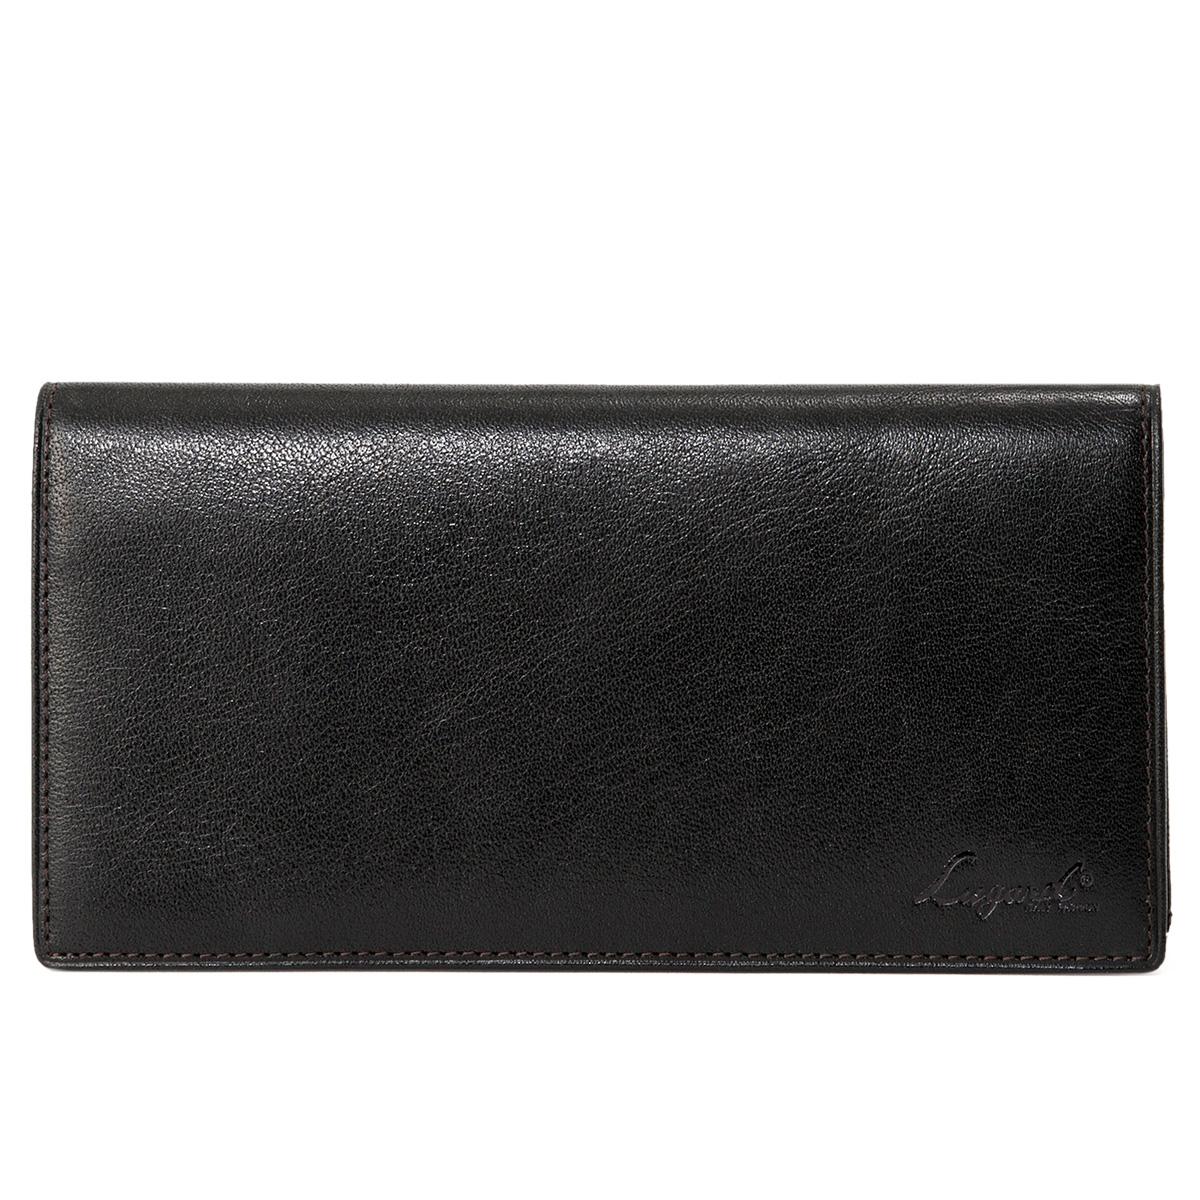 Lugard ラガード 青木鞄 財布 長財布 二つ折り G3 WALLET メンズ ジースリー ブラック ネイビー ブラウン 黒 5206